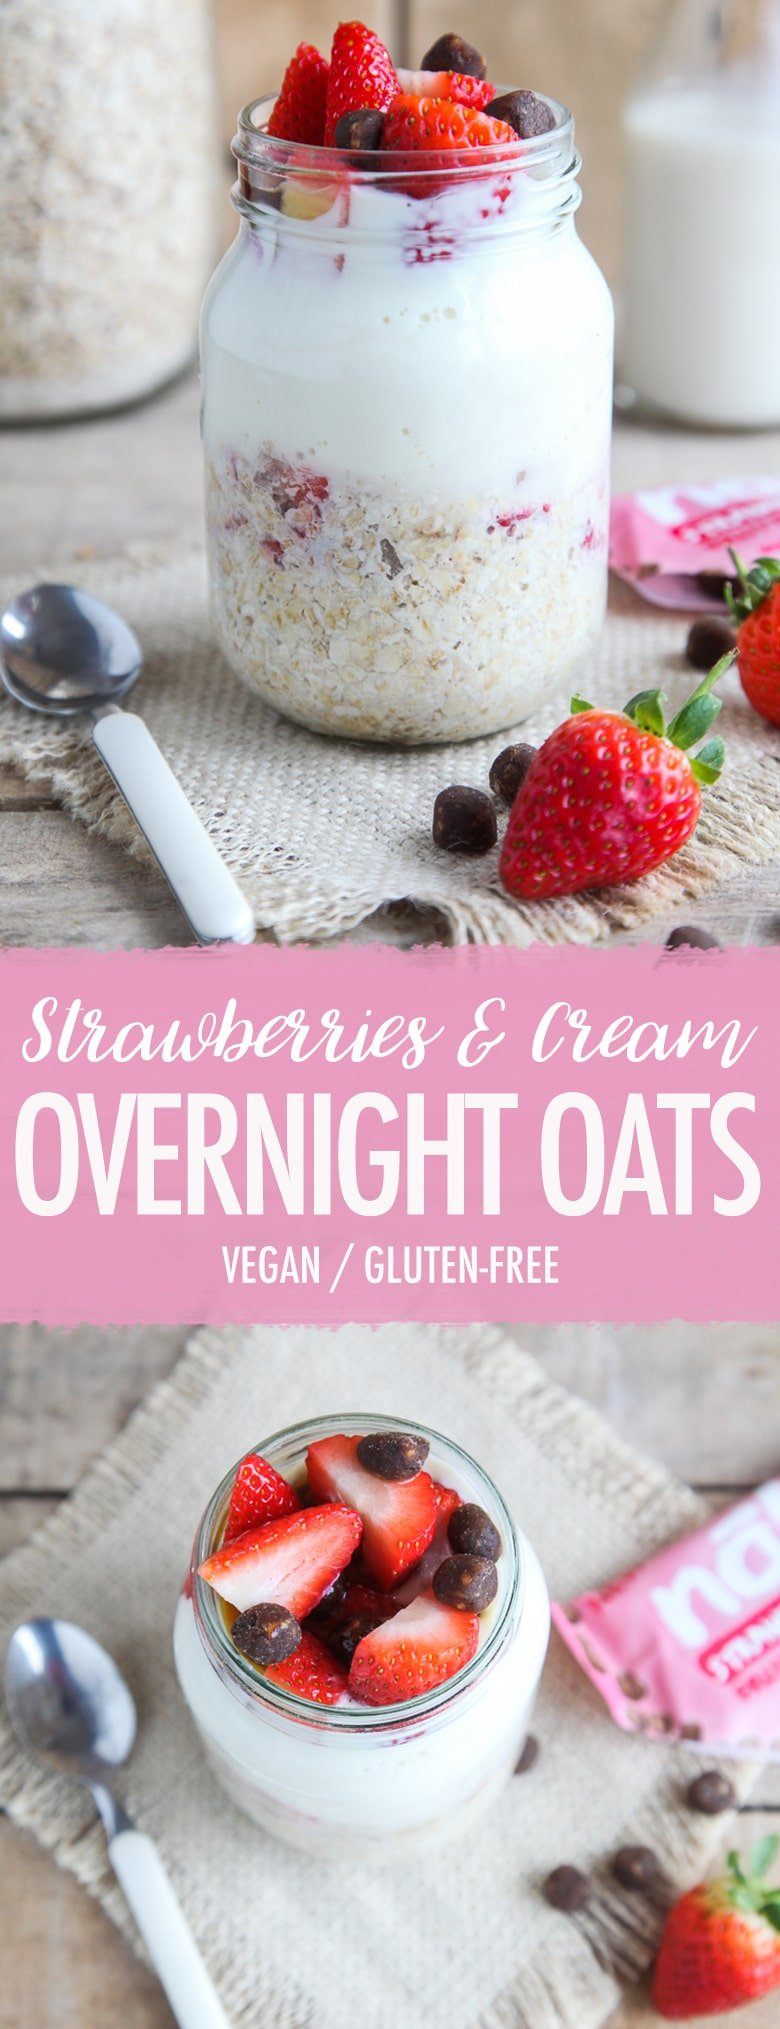 Strawberries & Cream Overnight Oats (Vegan + GF)